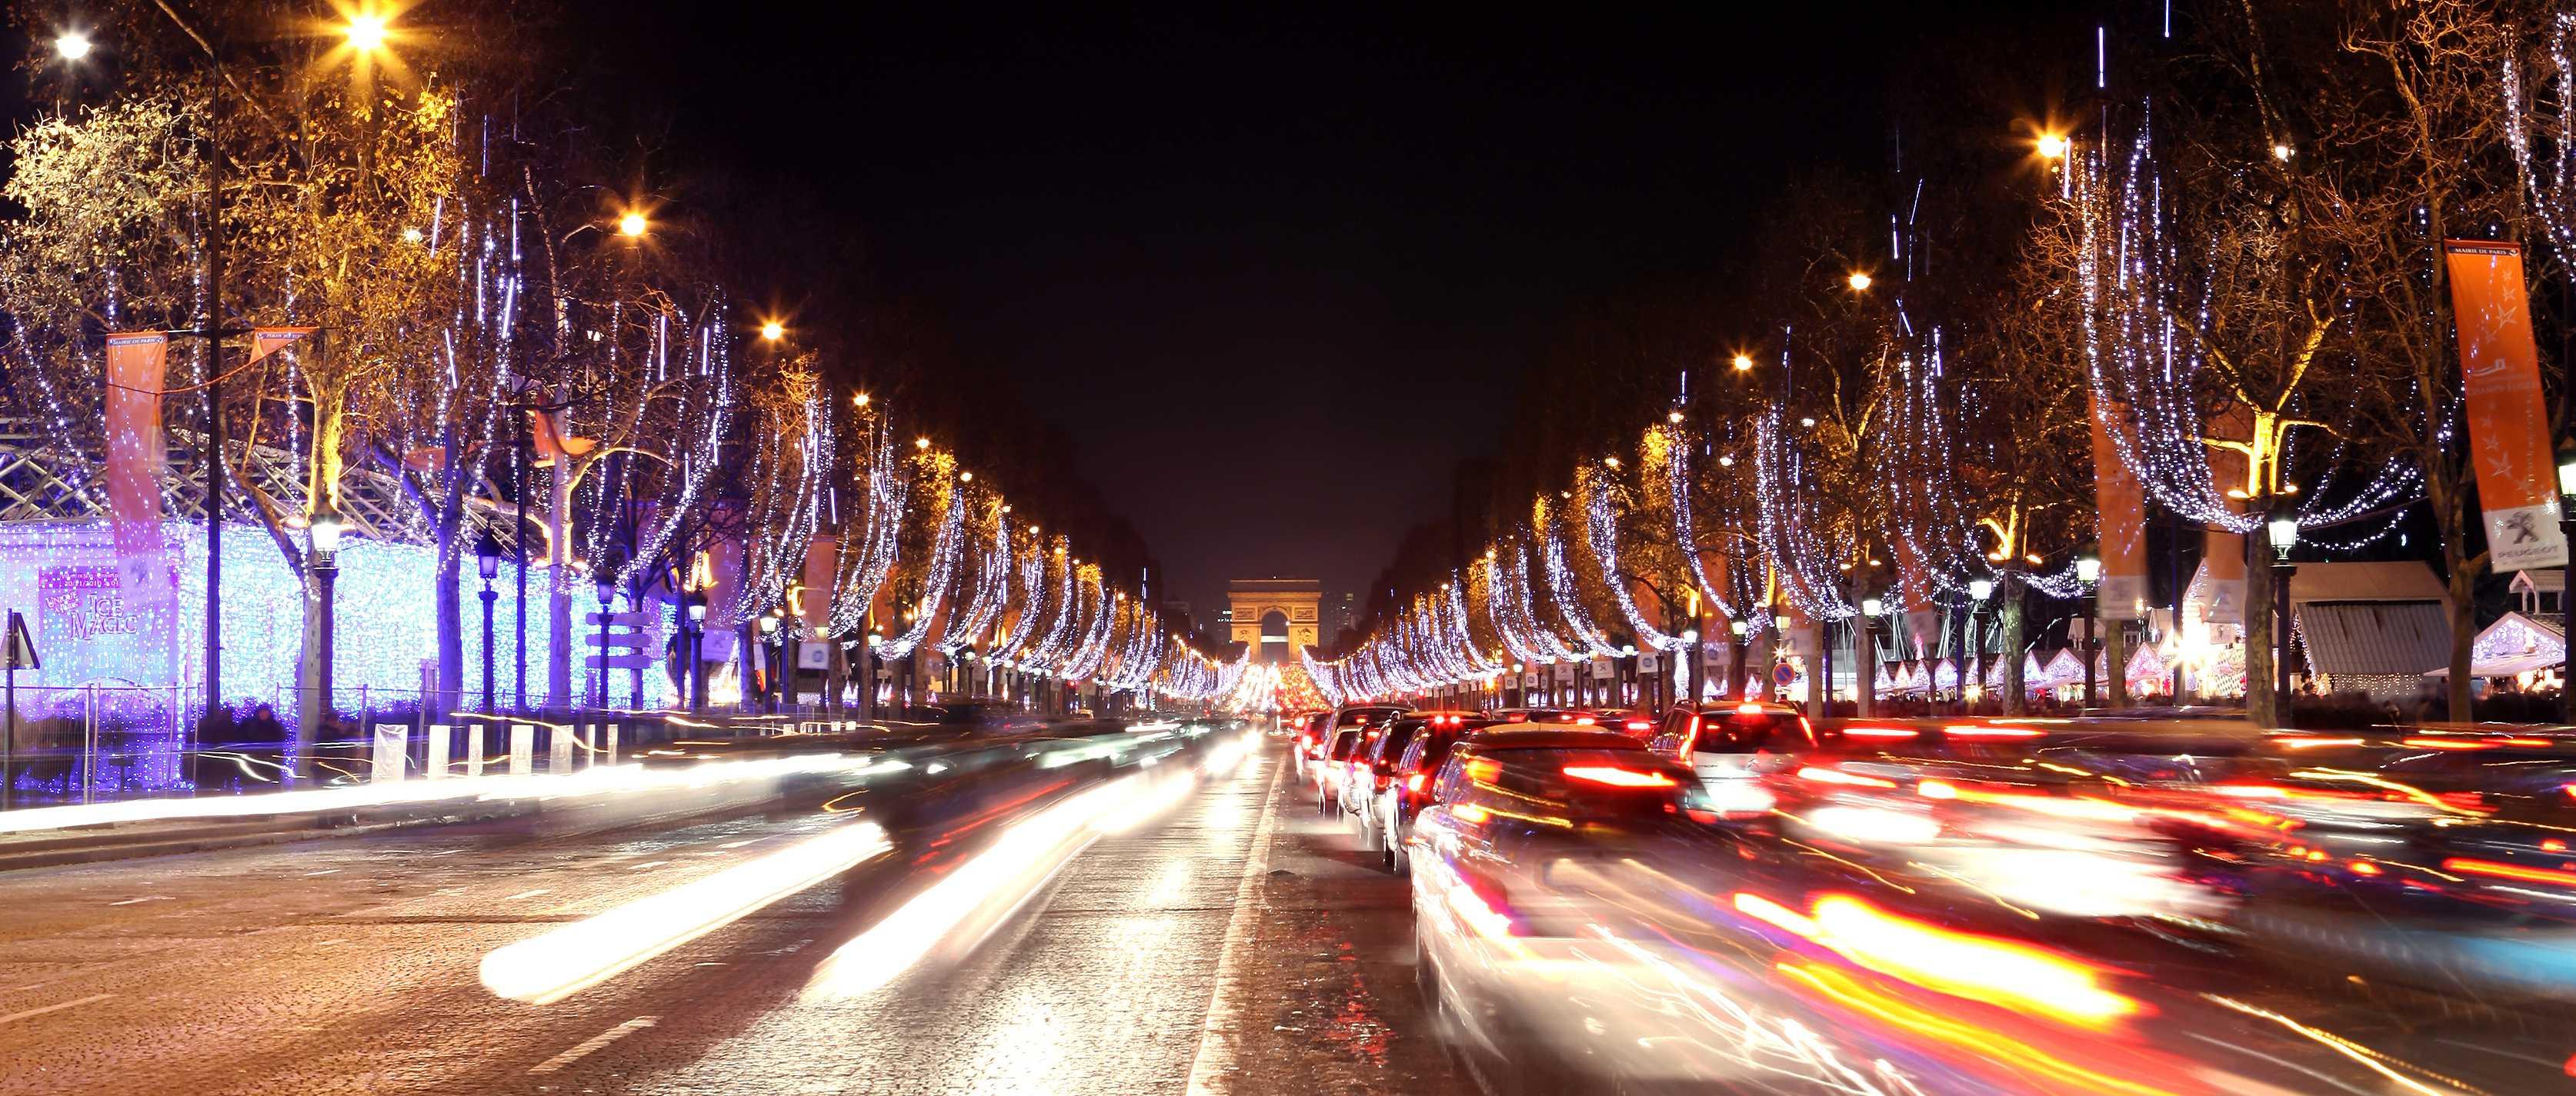 Les Illuminations des Champs Elysées